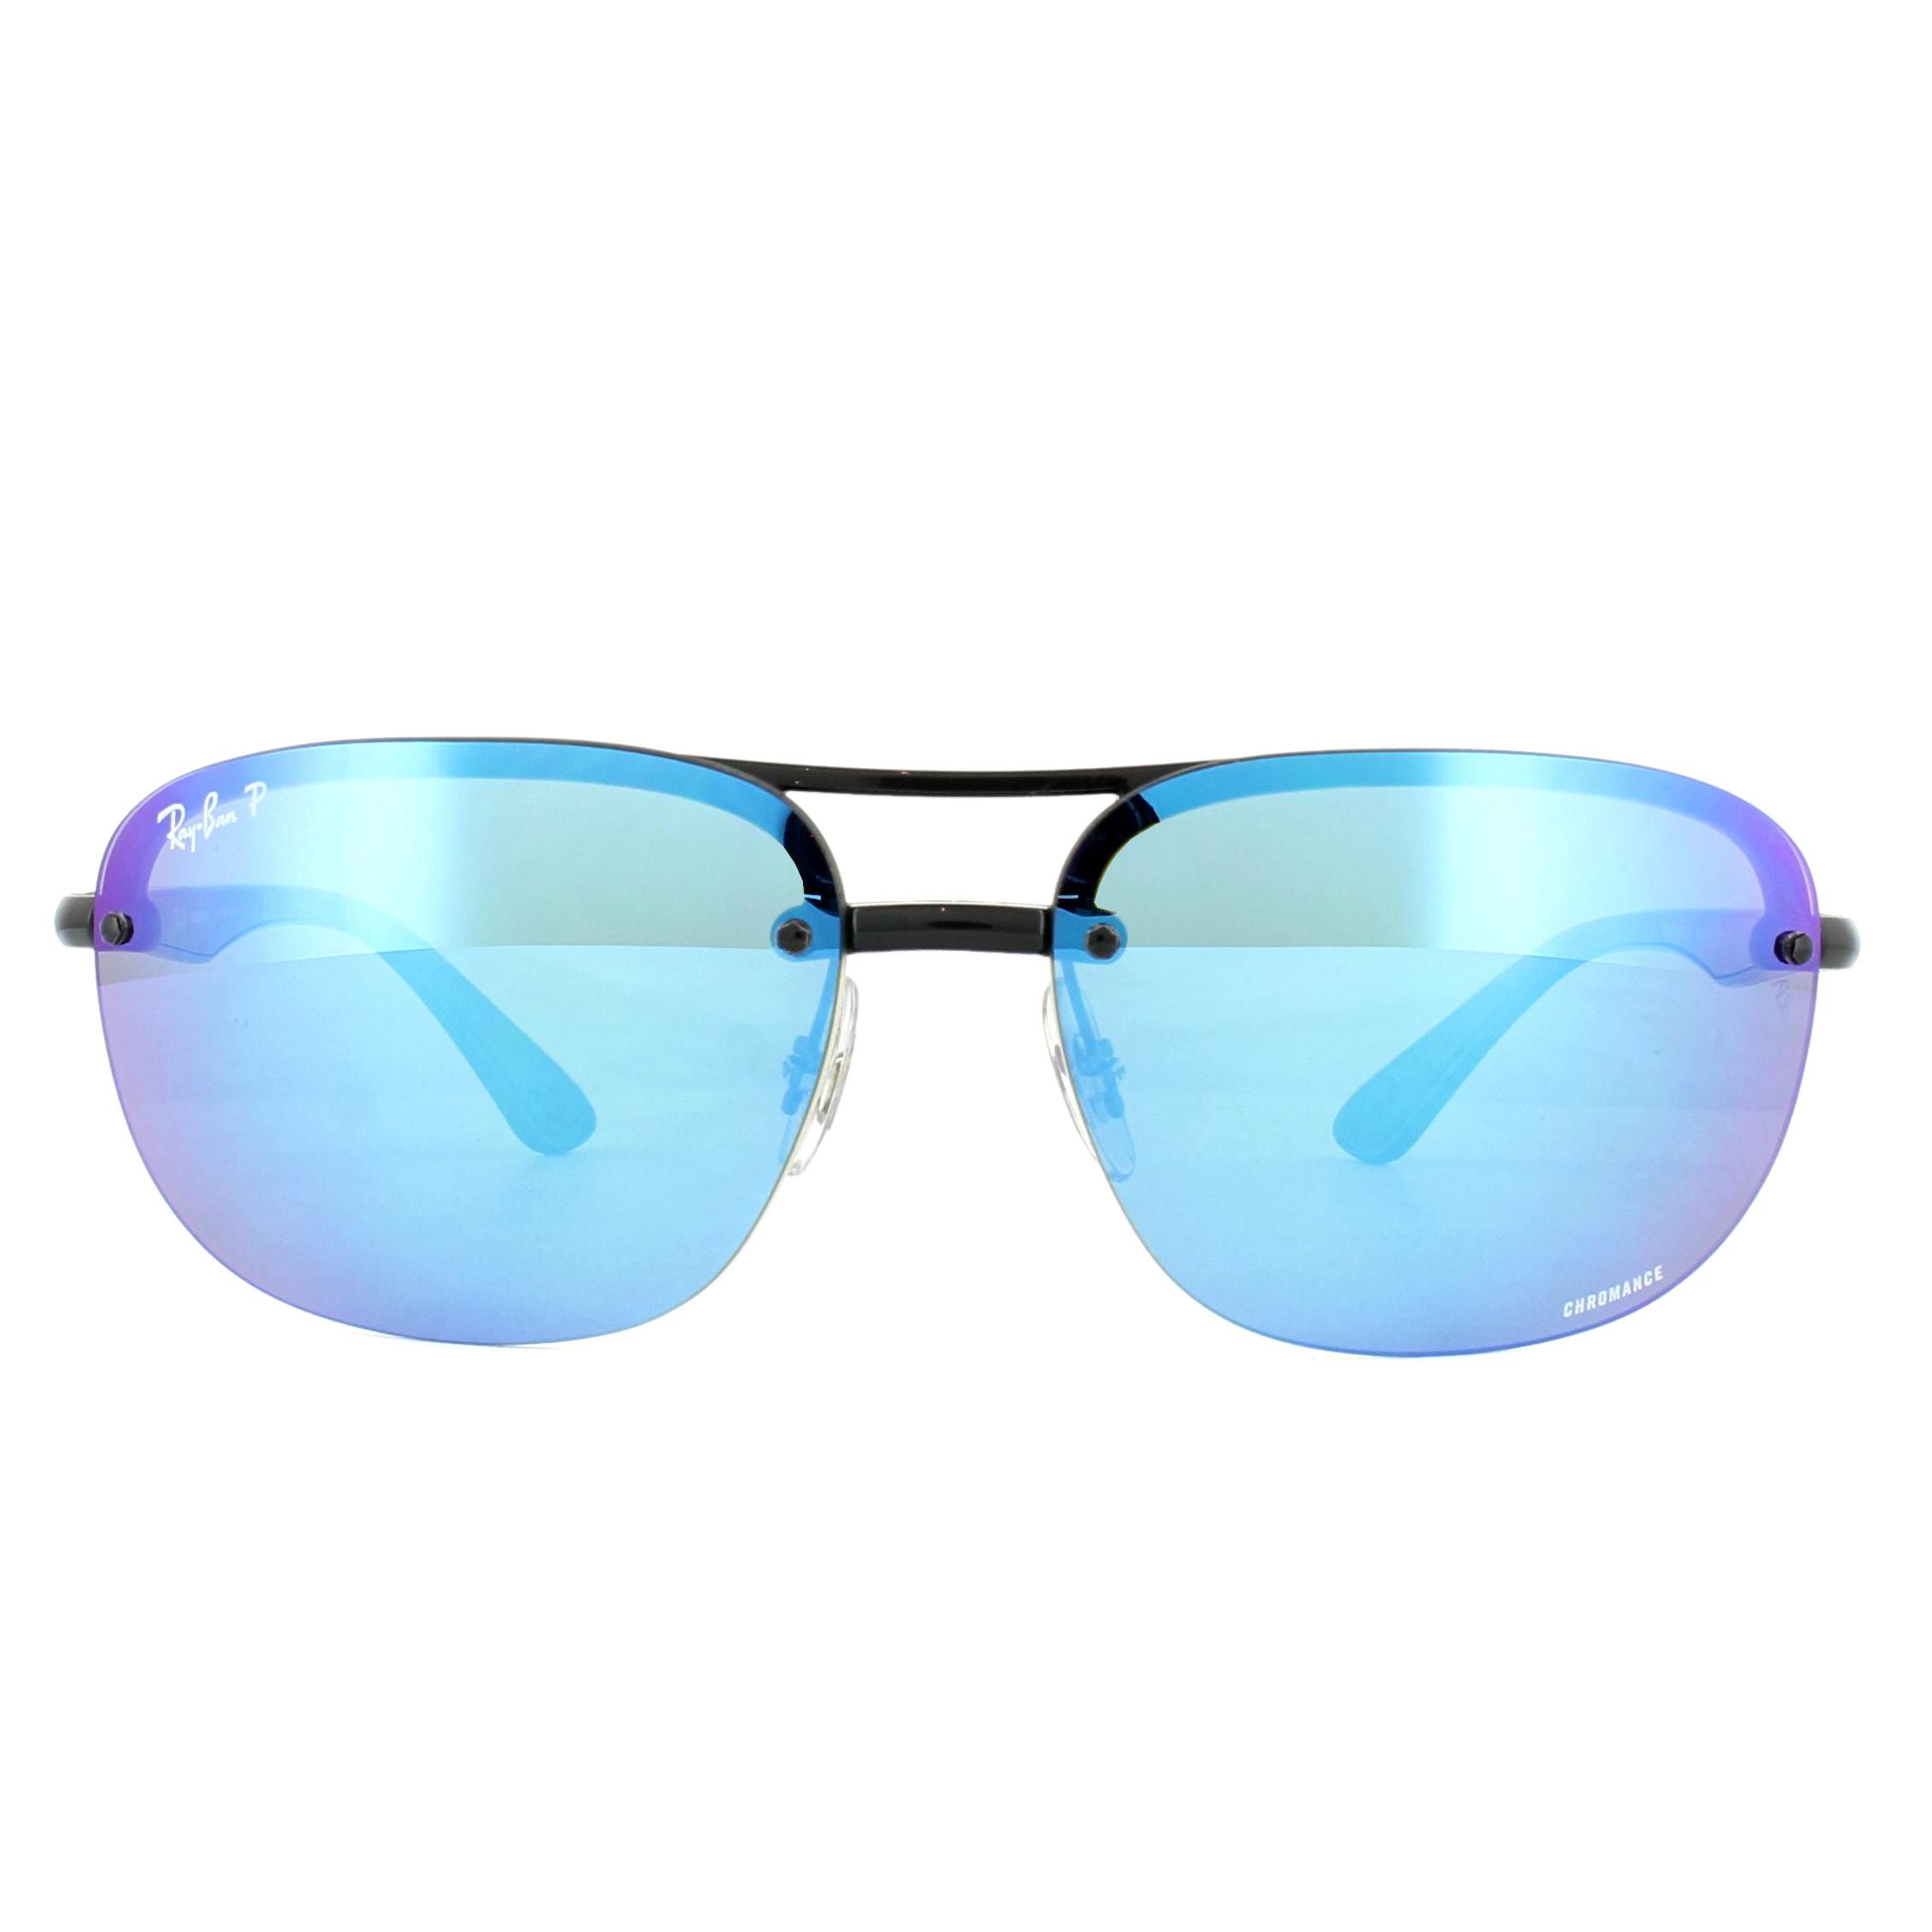 15f00b0190 Sentinel Ray-Ban Sunglasses RB4275CH 601 A1 Black Blue Mirror Polarized  Chromance